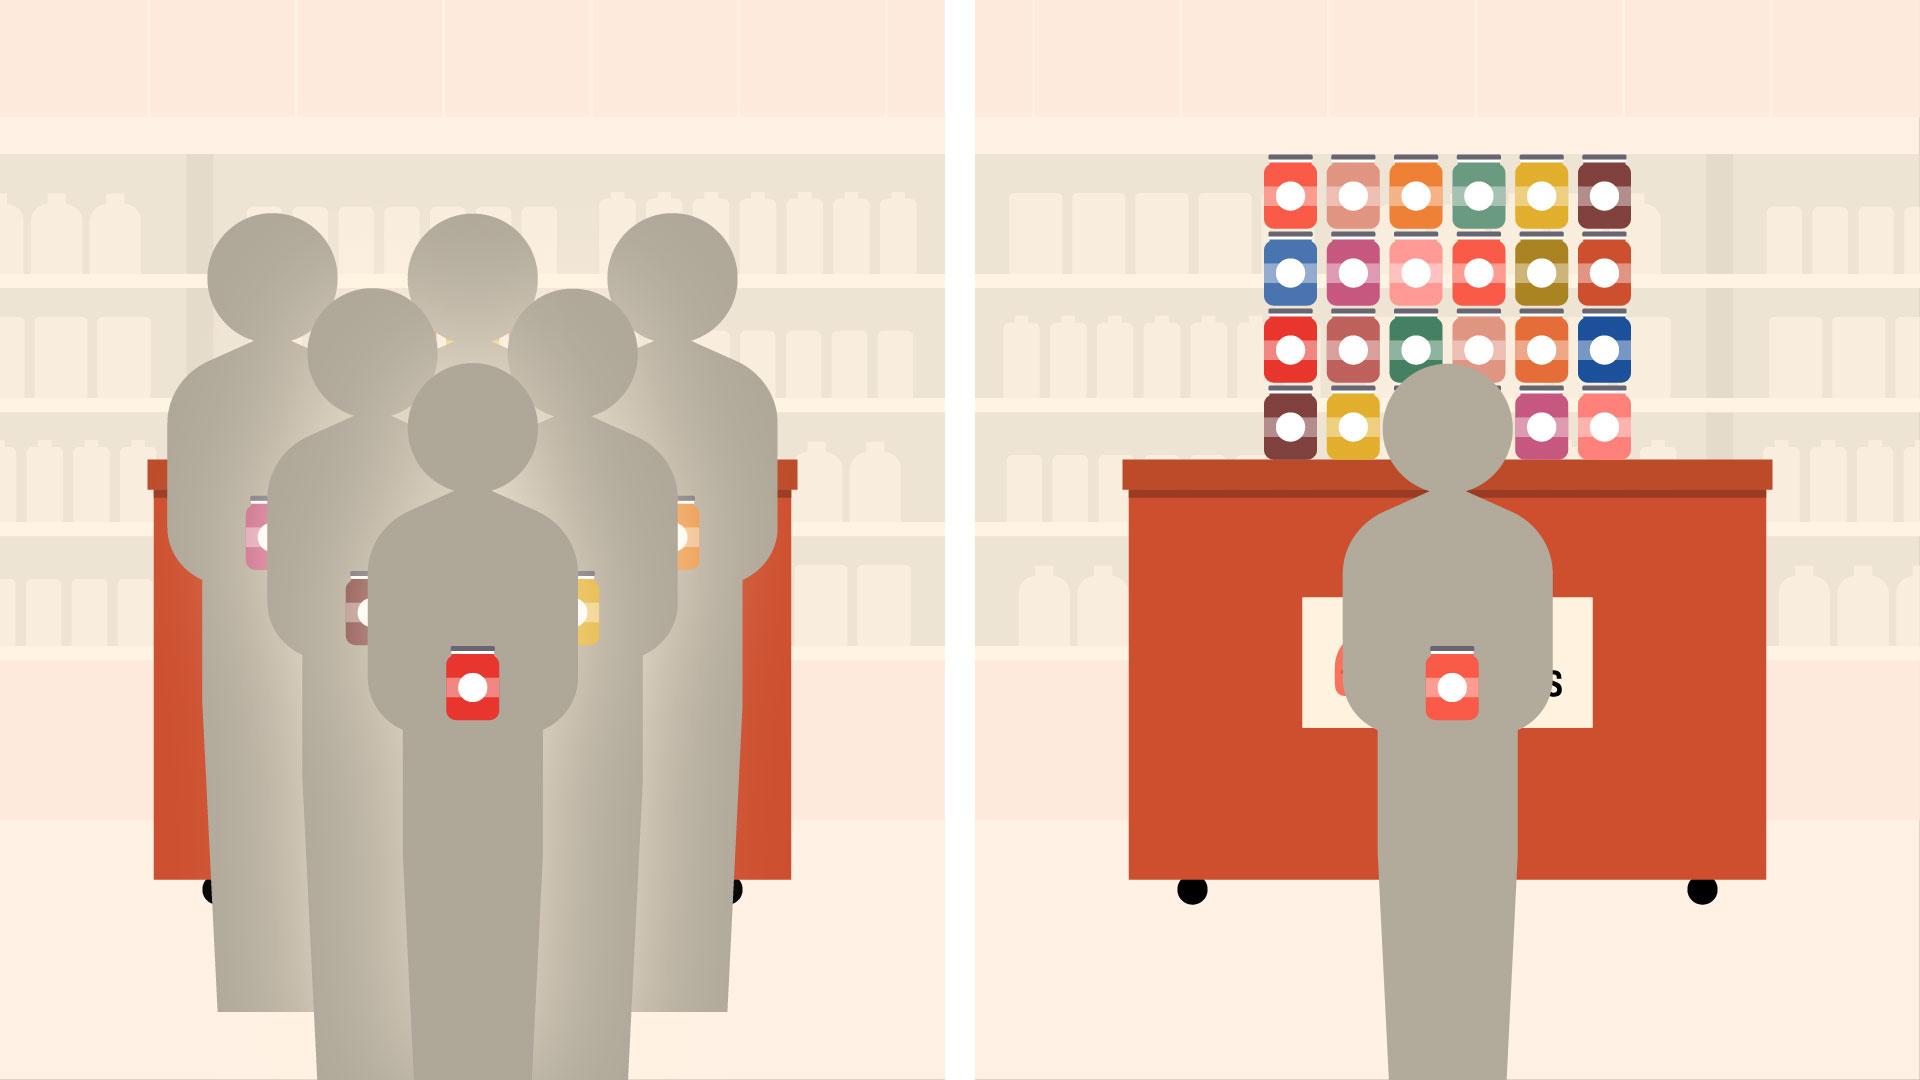 6 paying customers vs. 1 paying customer